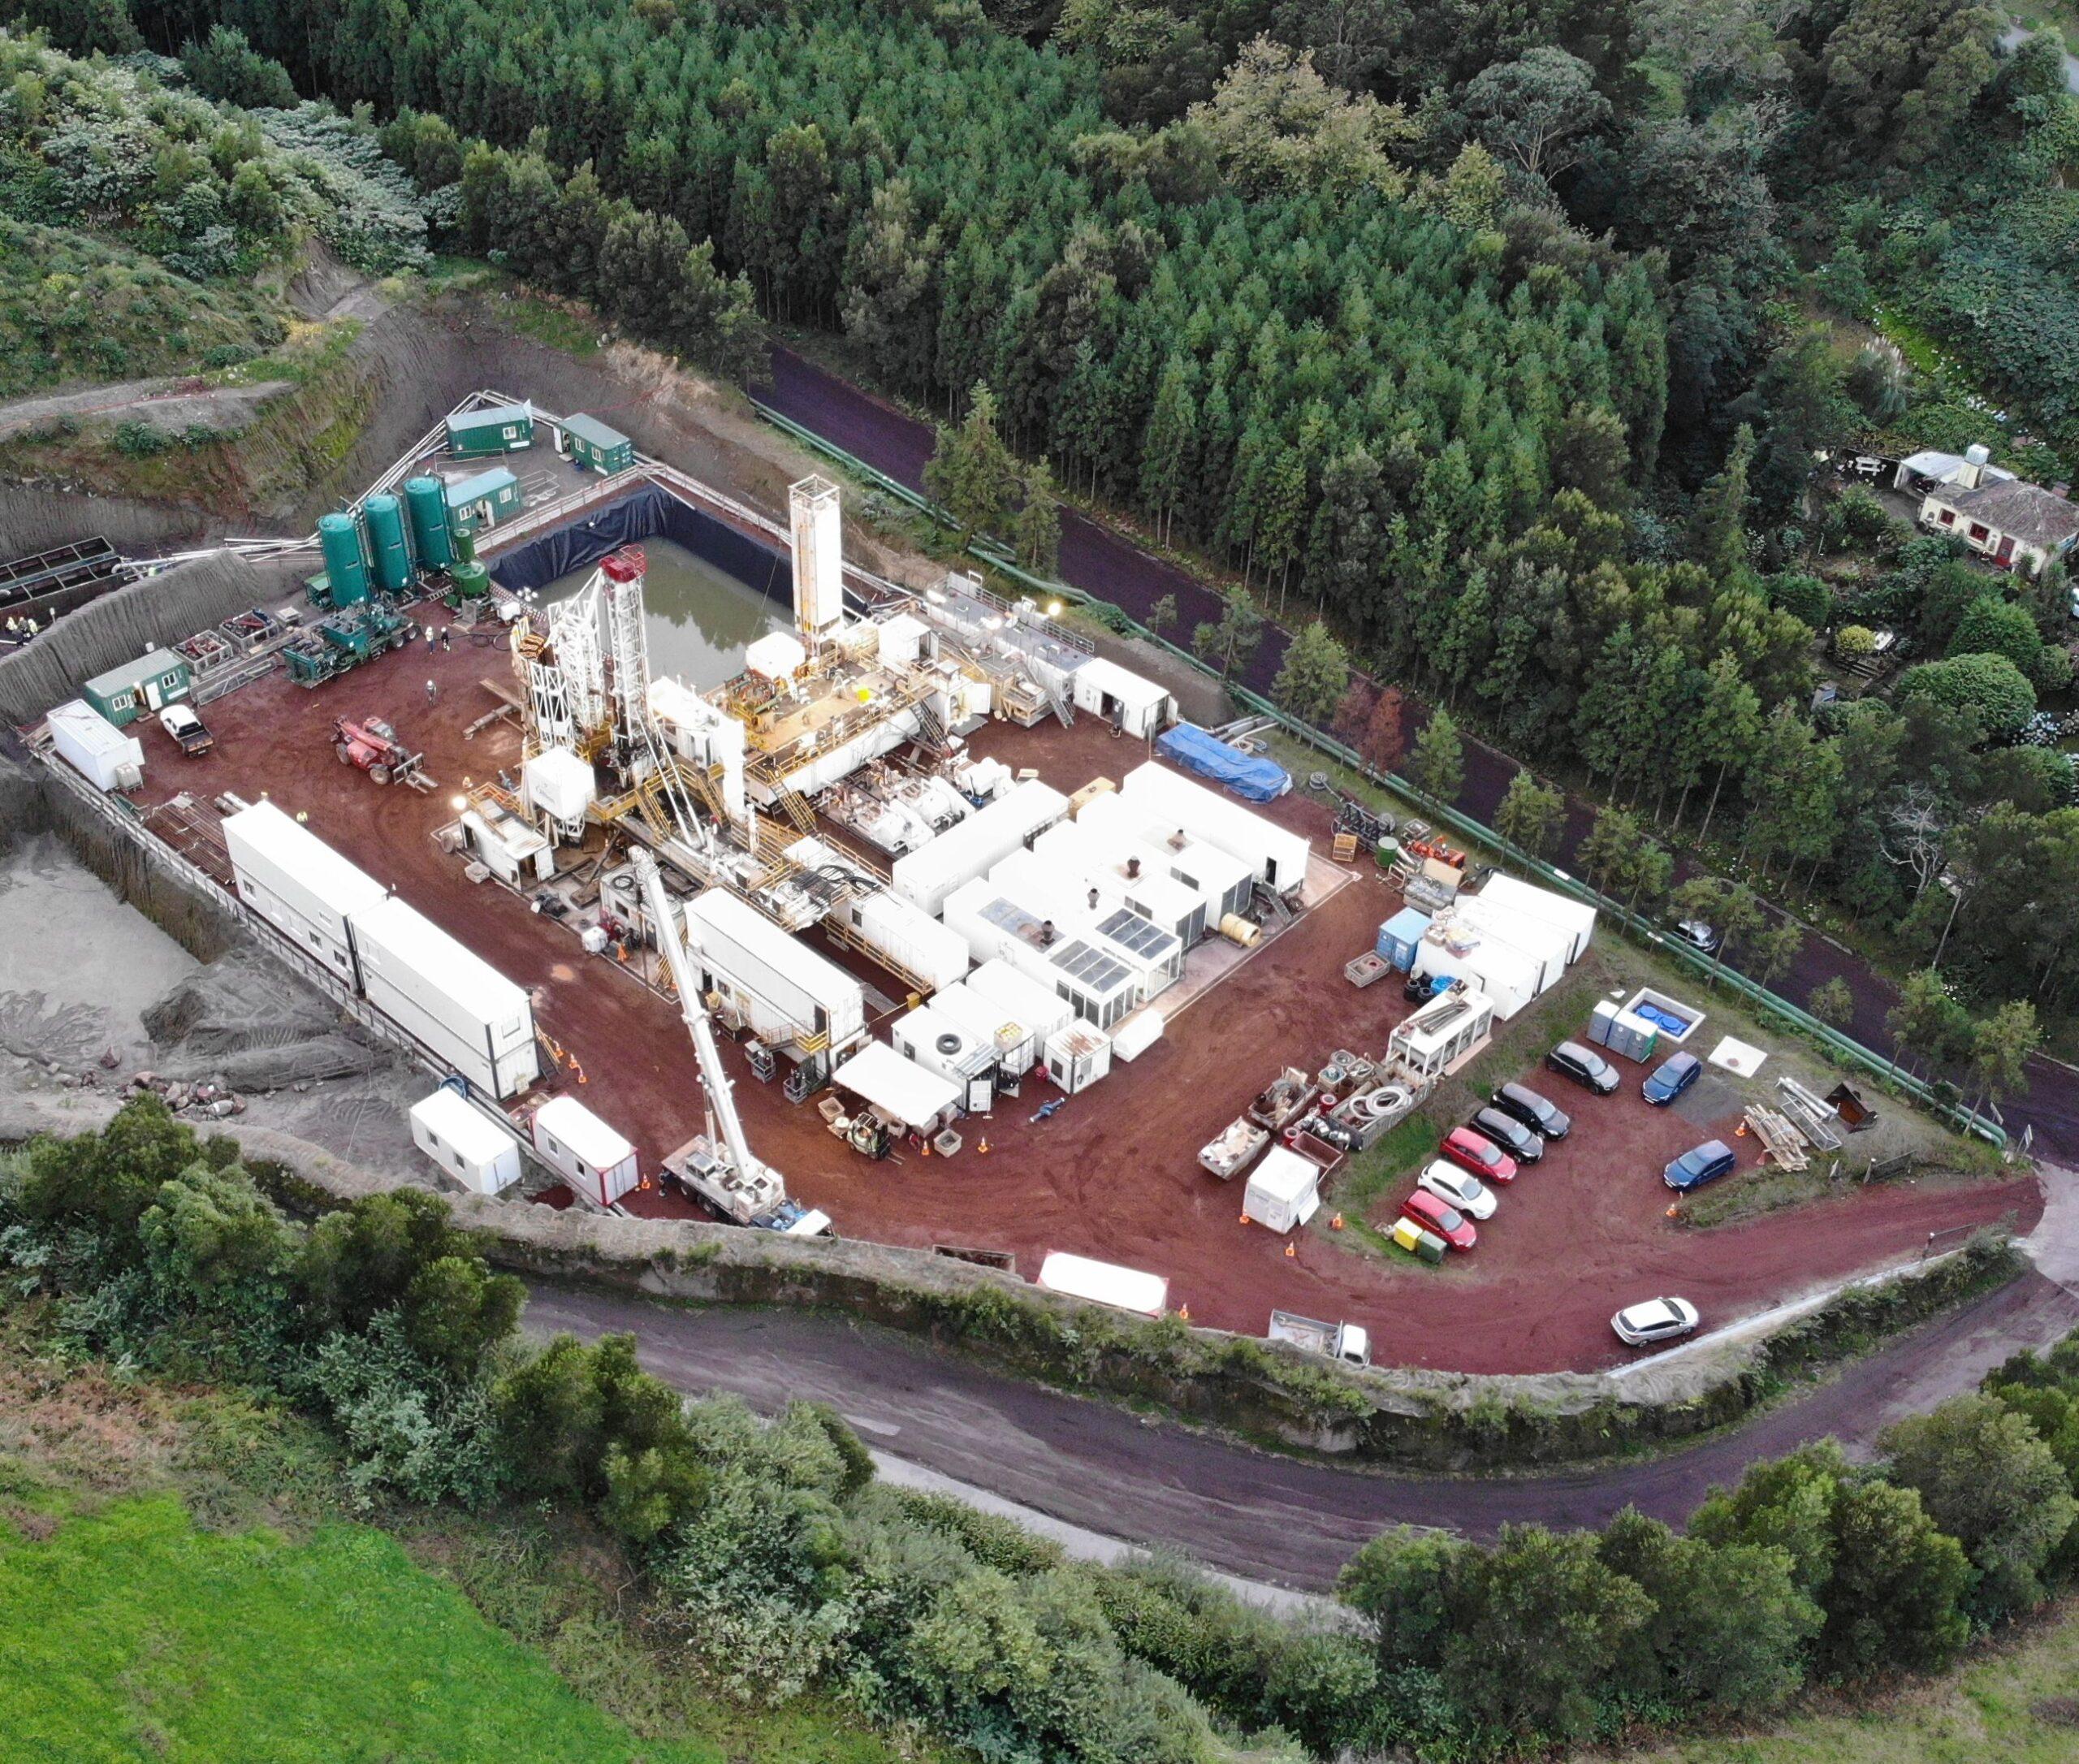 IDC Drillmec HH-220 rig on the island of Azores